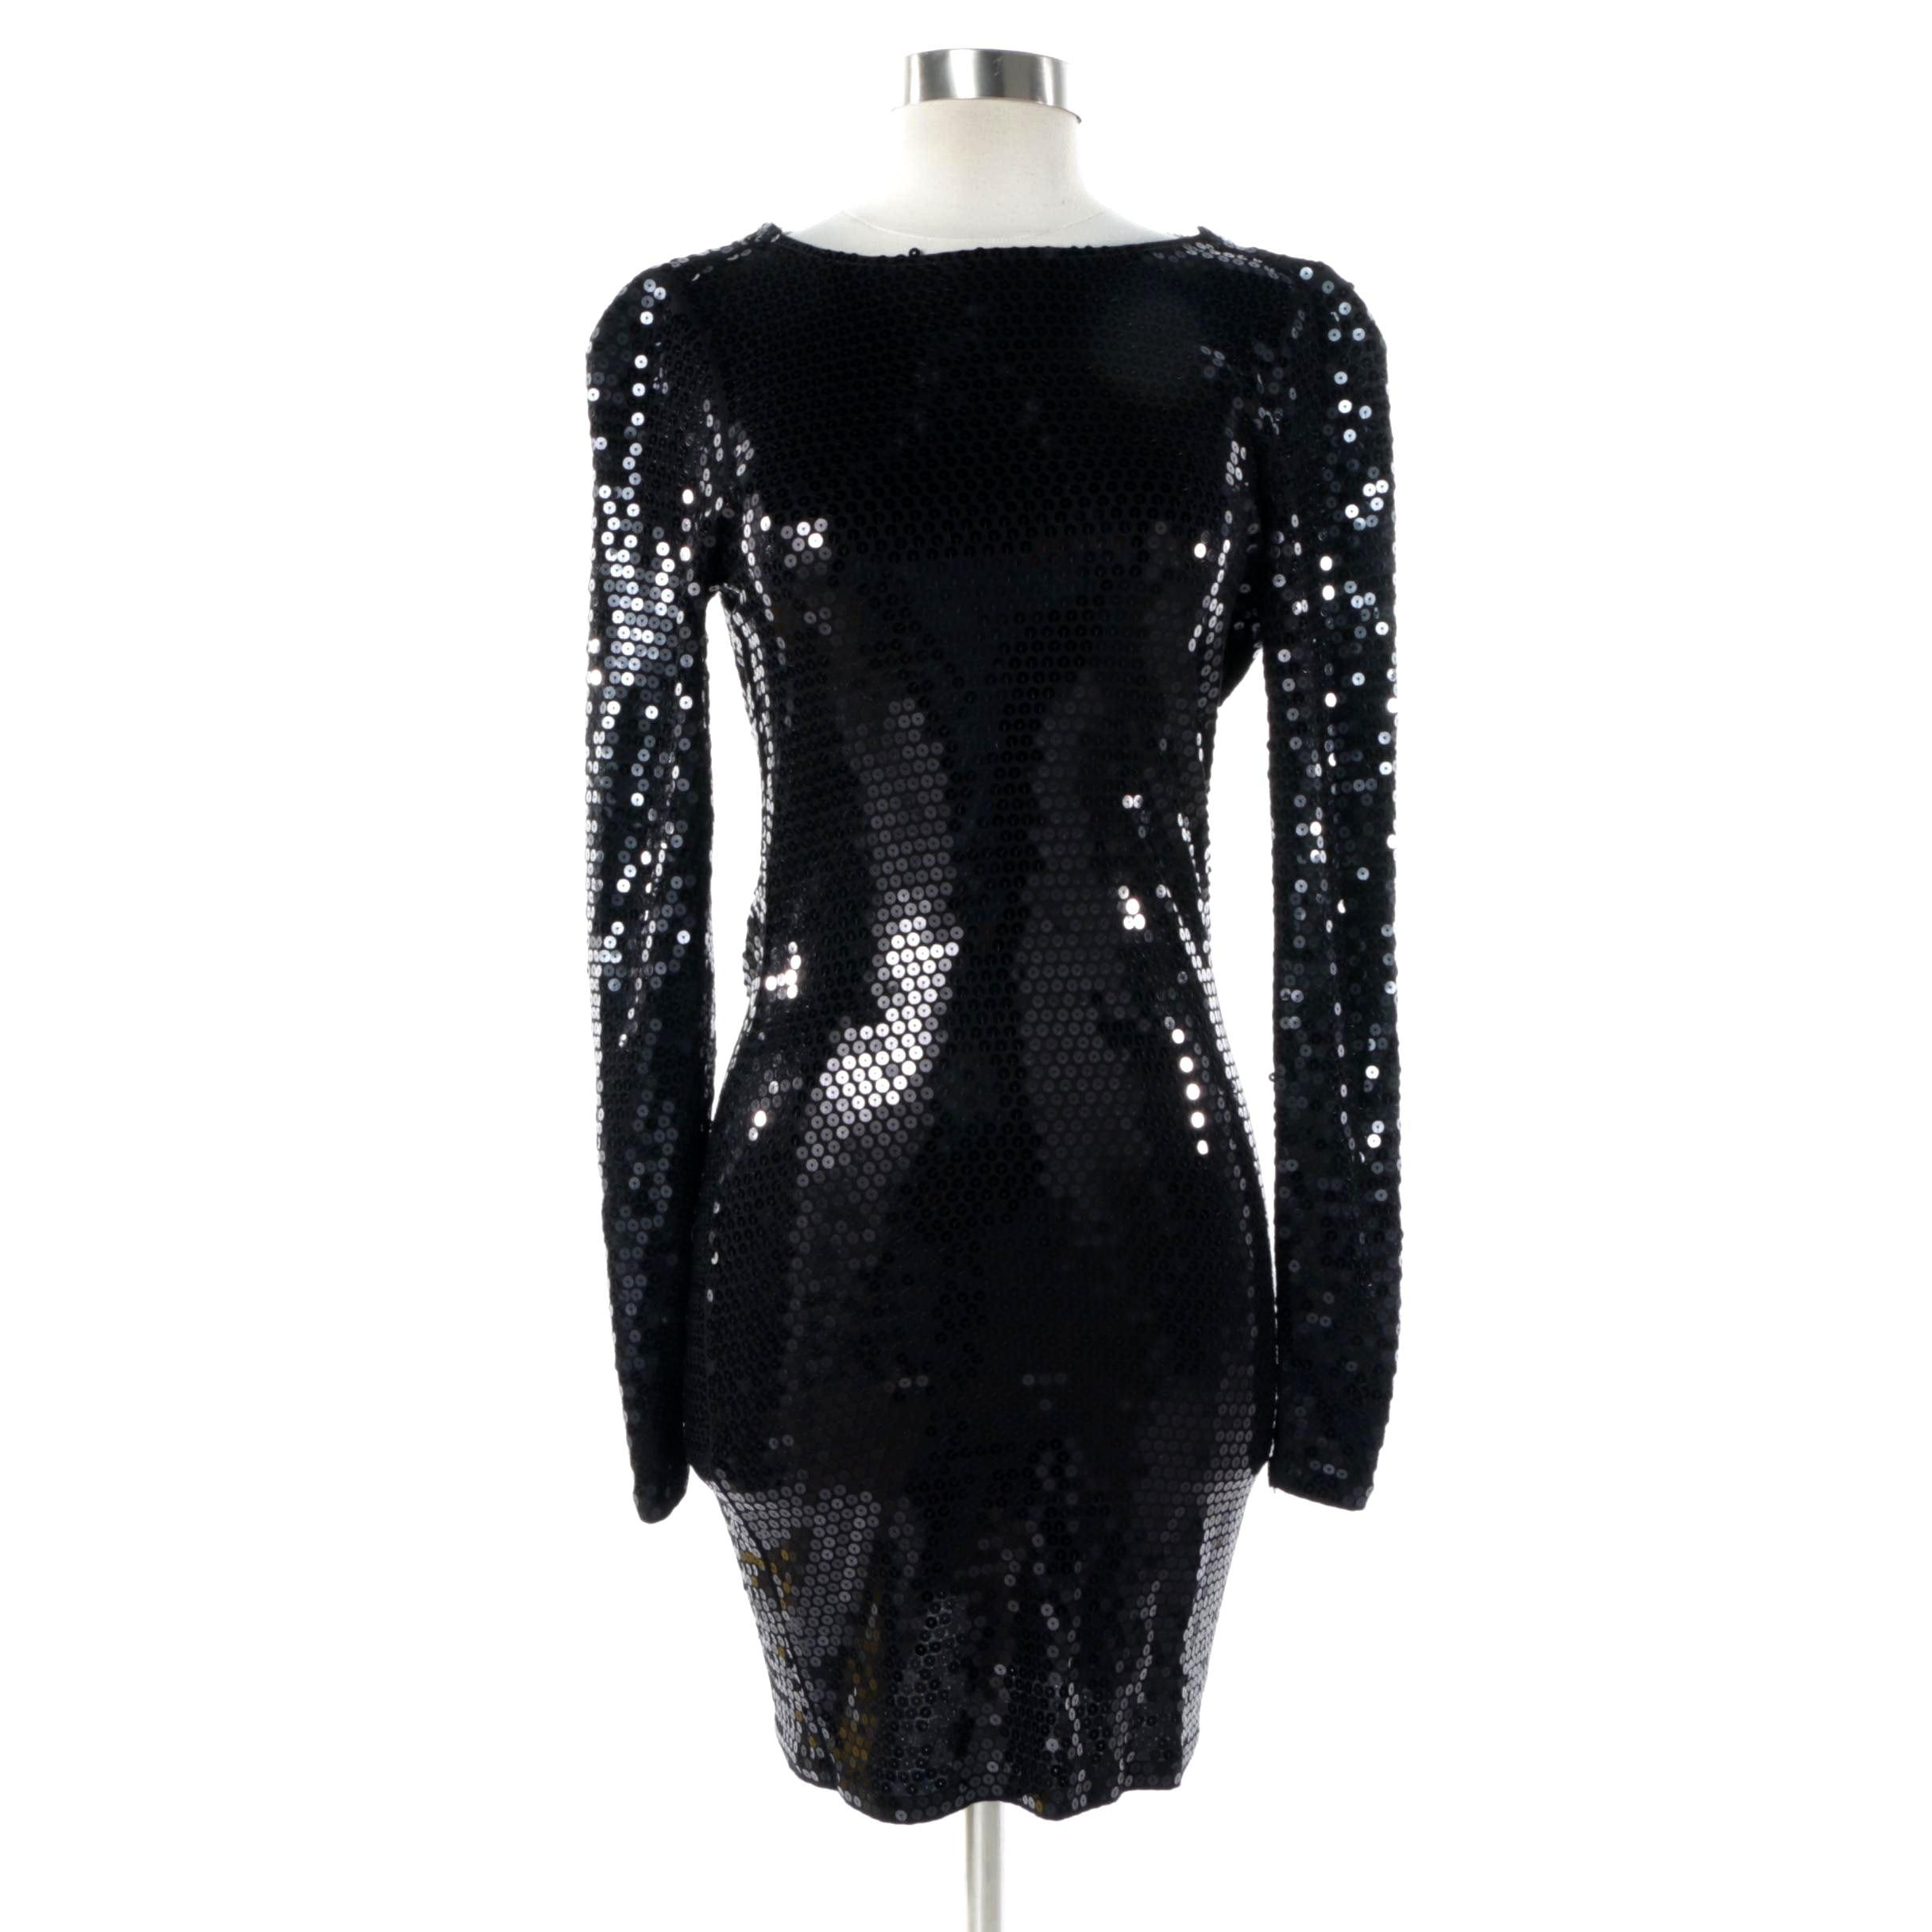 Michael Michael Kors Black Sequin Cocktail Dress with Original Tags